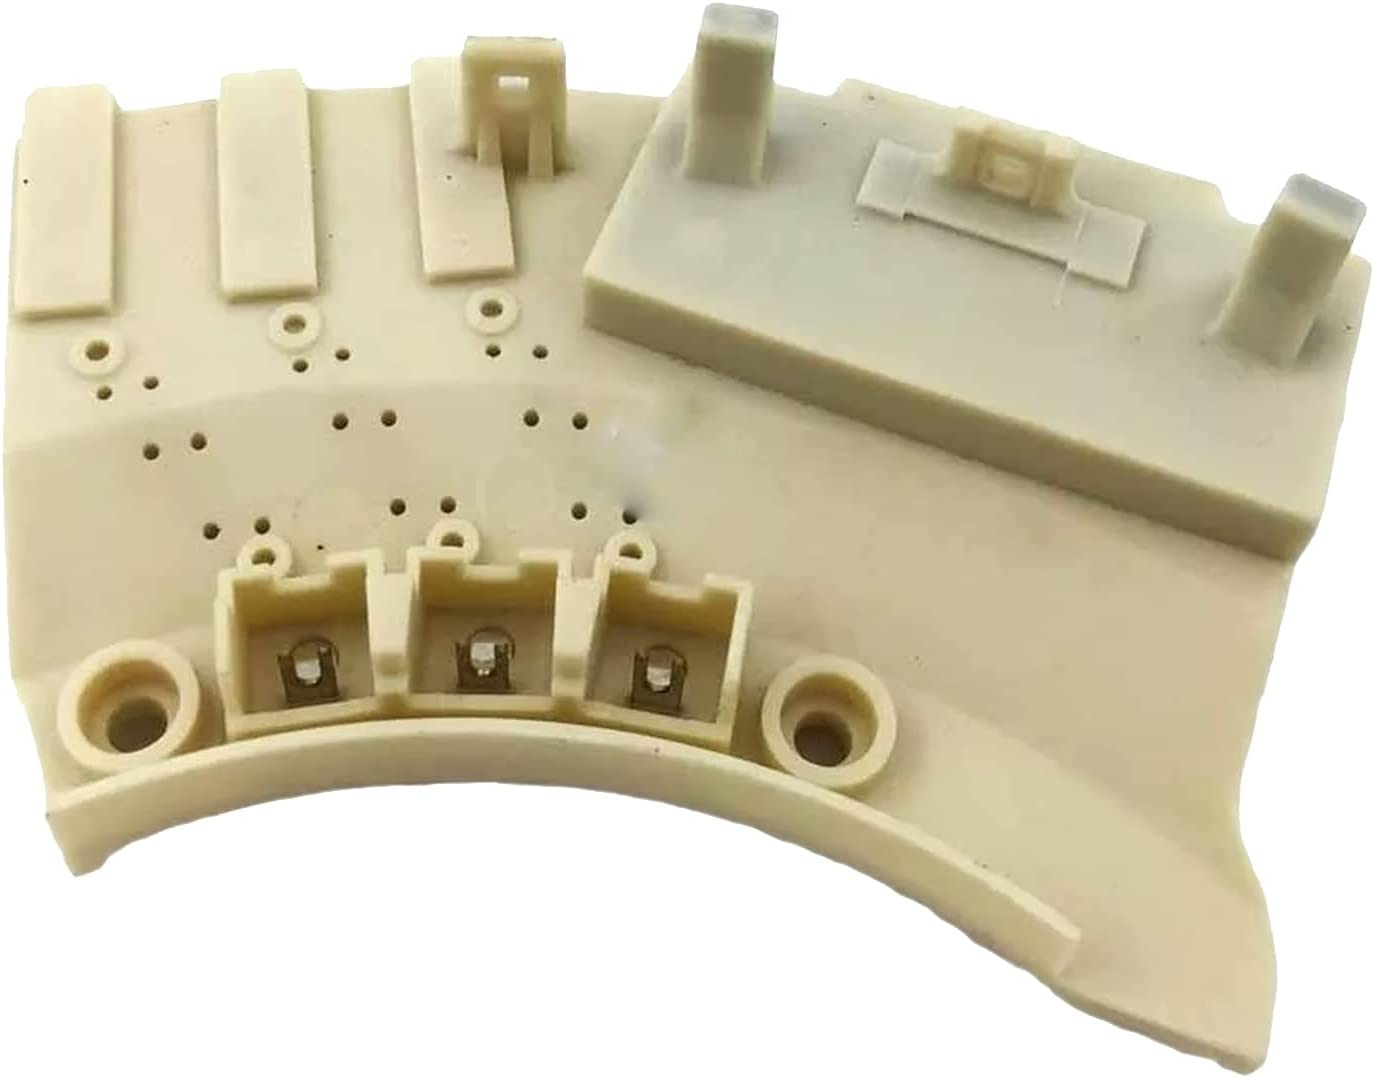 Product MMingx for Samsung Washing Machine Hall Sensor Hal Holzer Manufacturer OFFicial shop